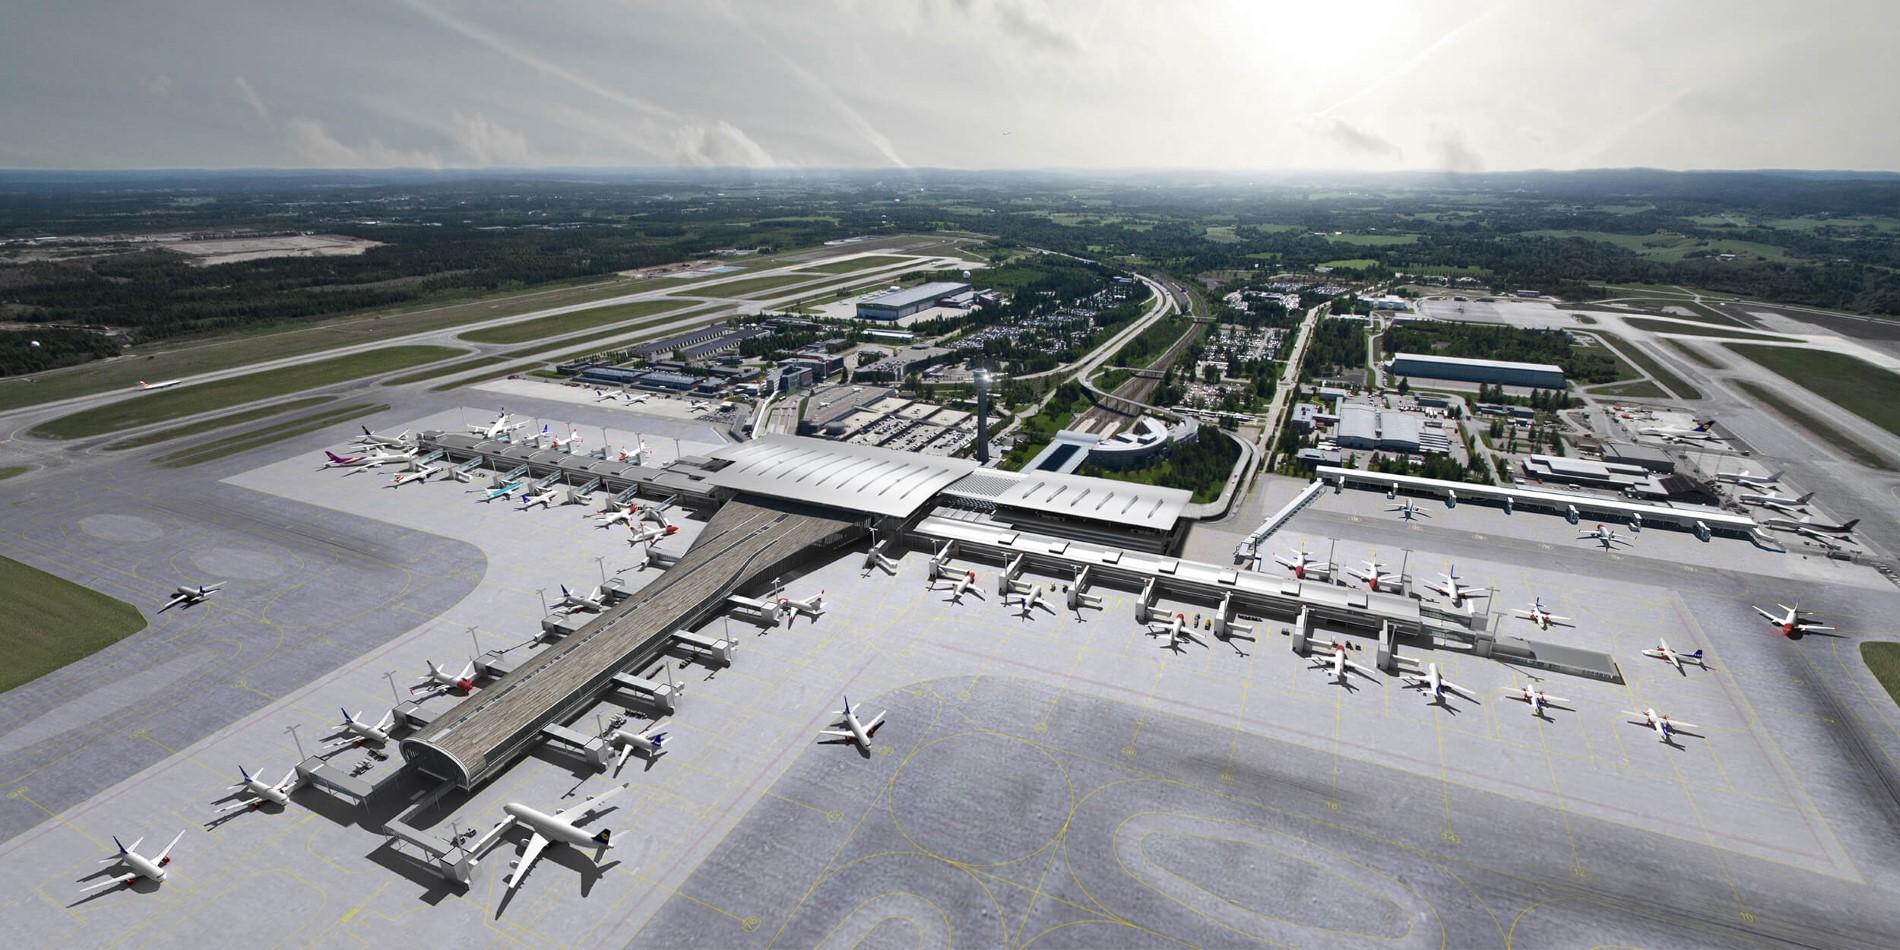 فرودگاه بین المللی گاردرموئن اسلو